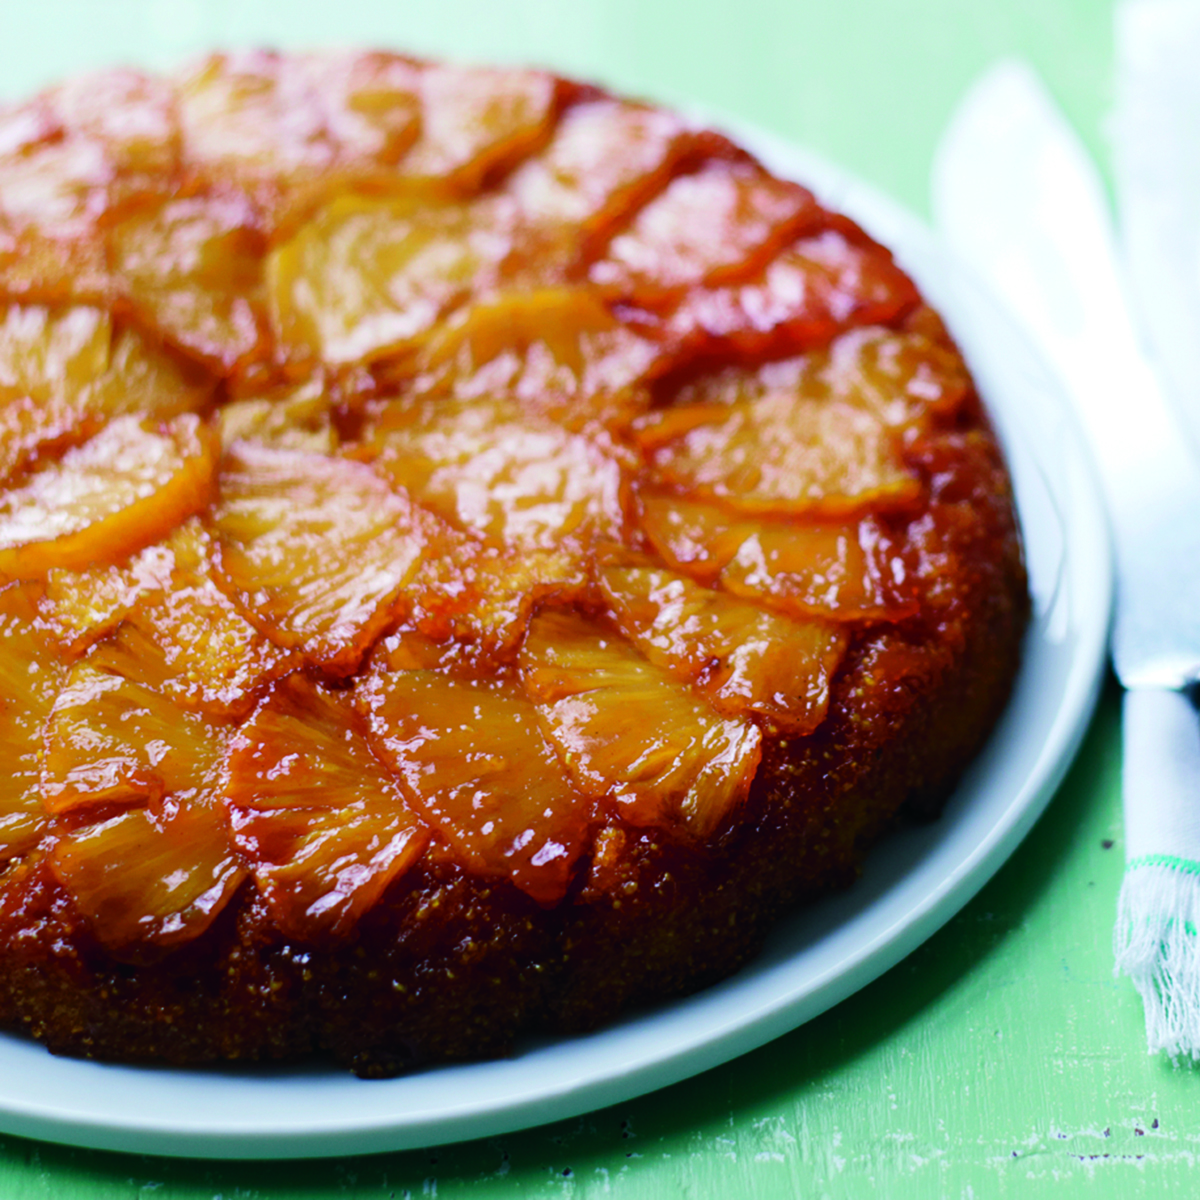 Pineapple Upside-Down Corn Cake